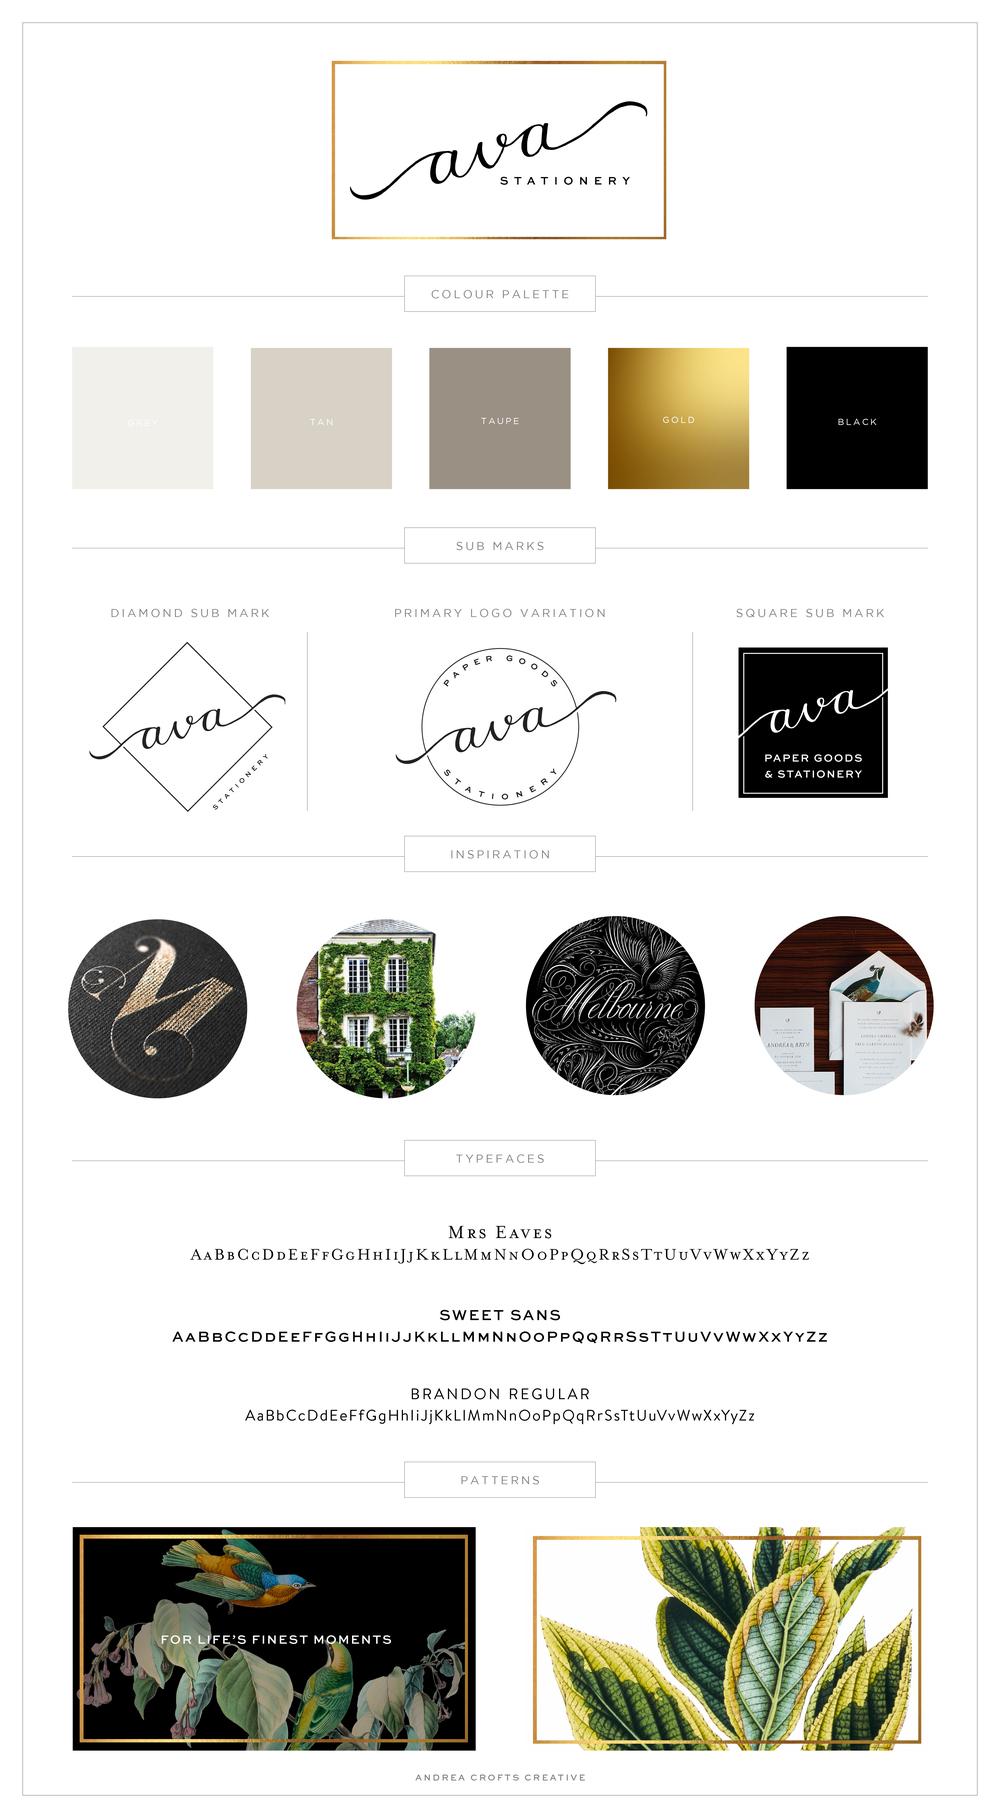 Brand Board - Ava Stationery by Andrea Crofts Creative